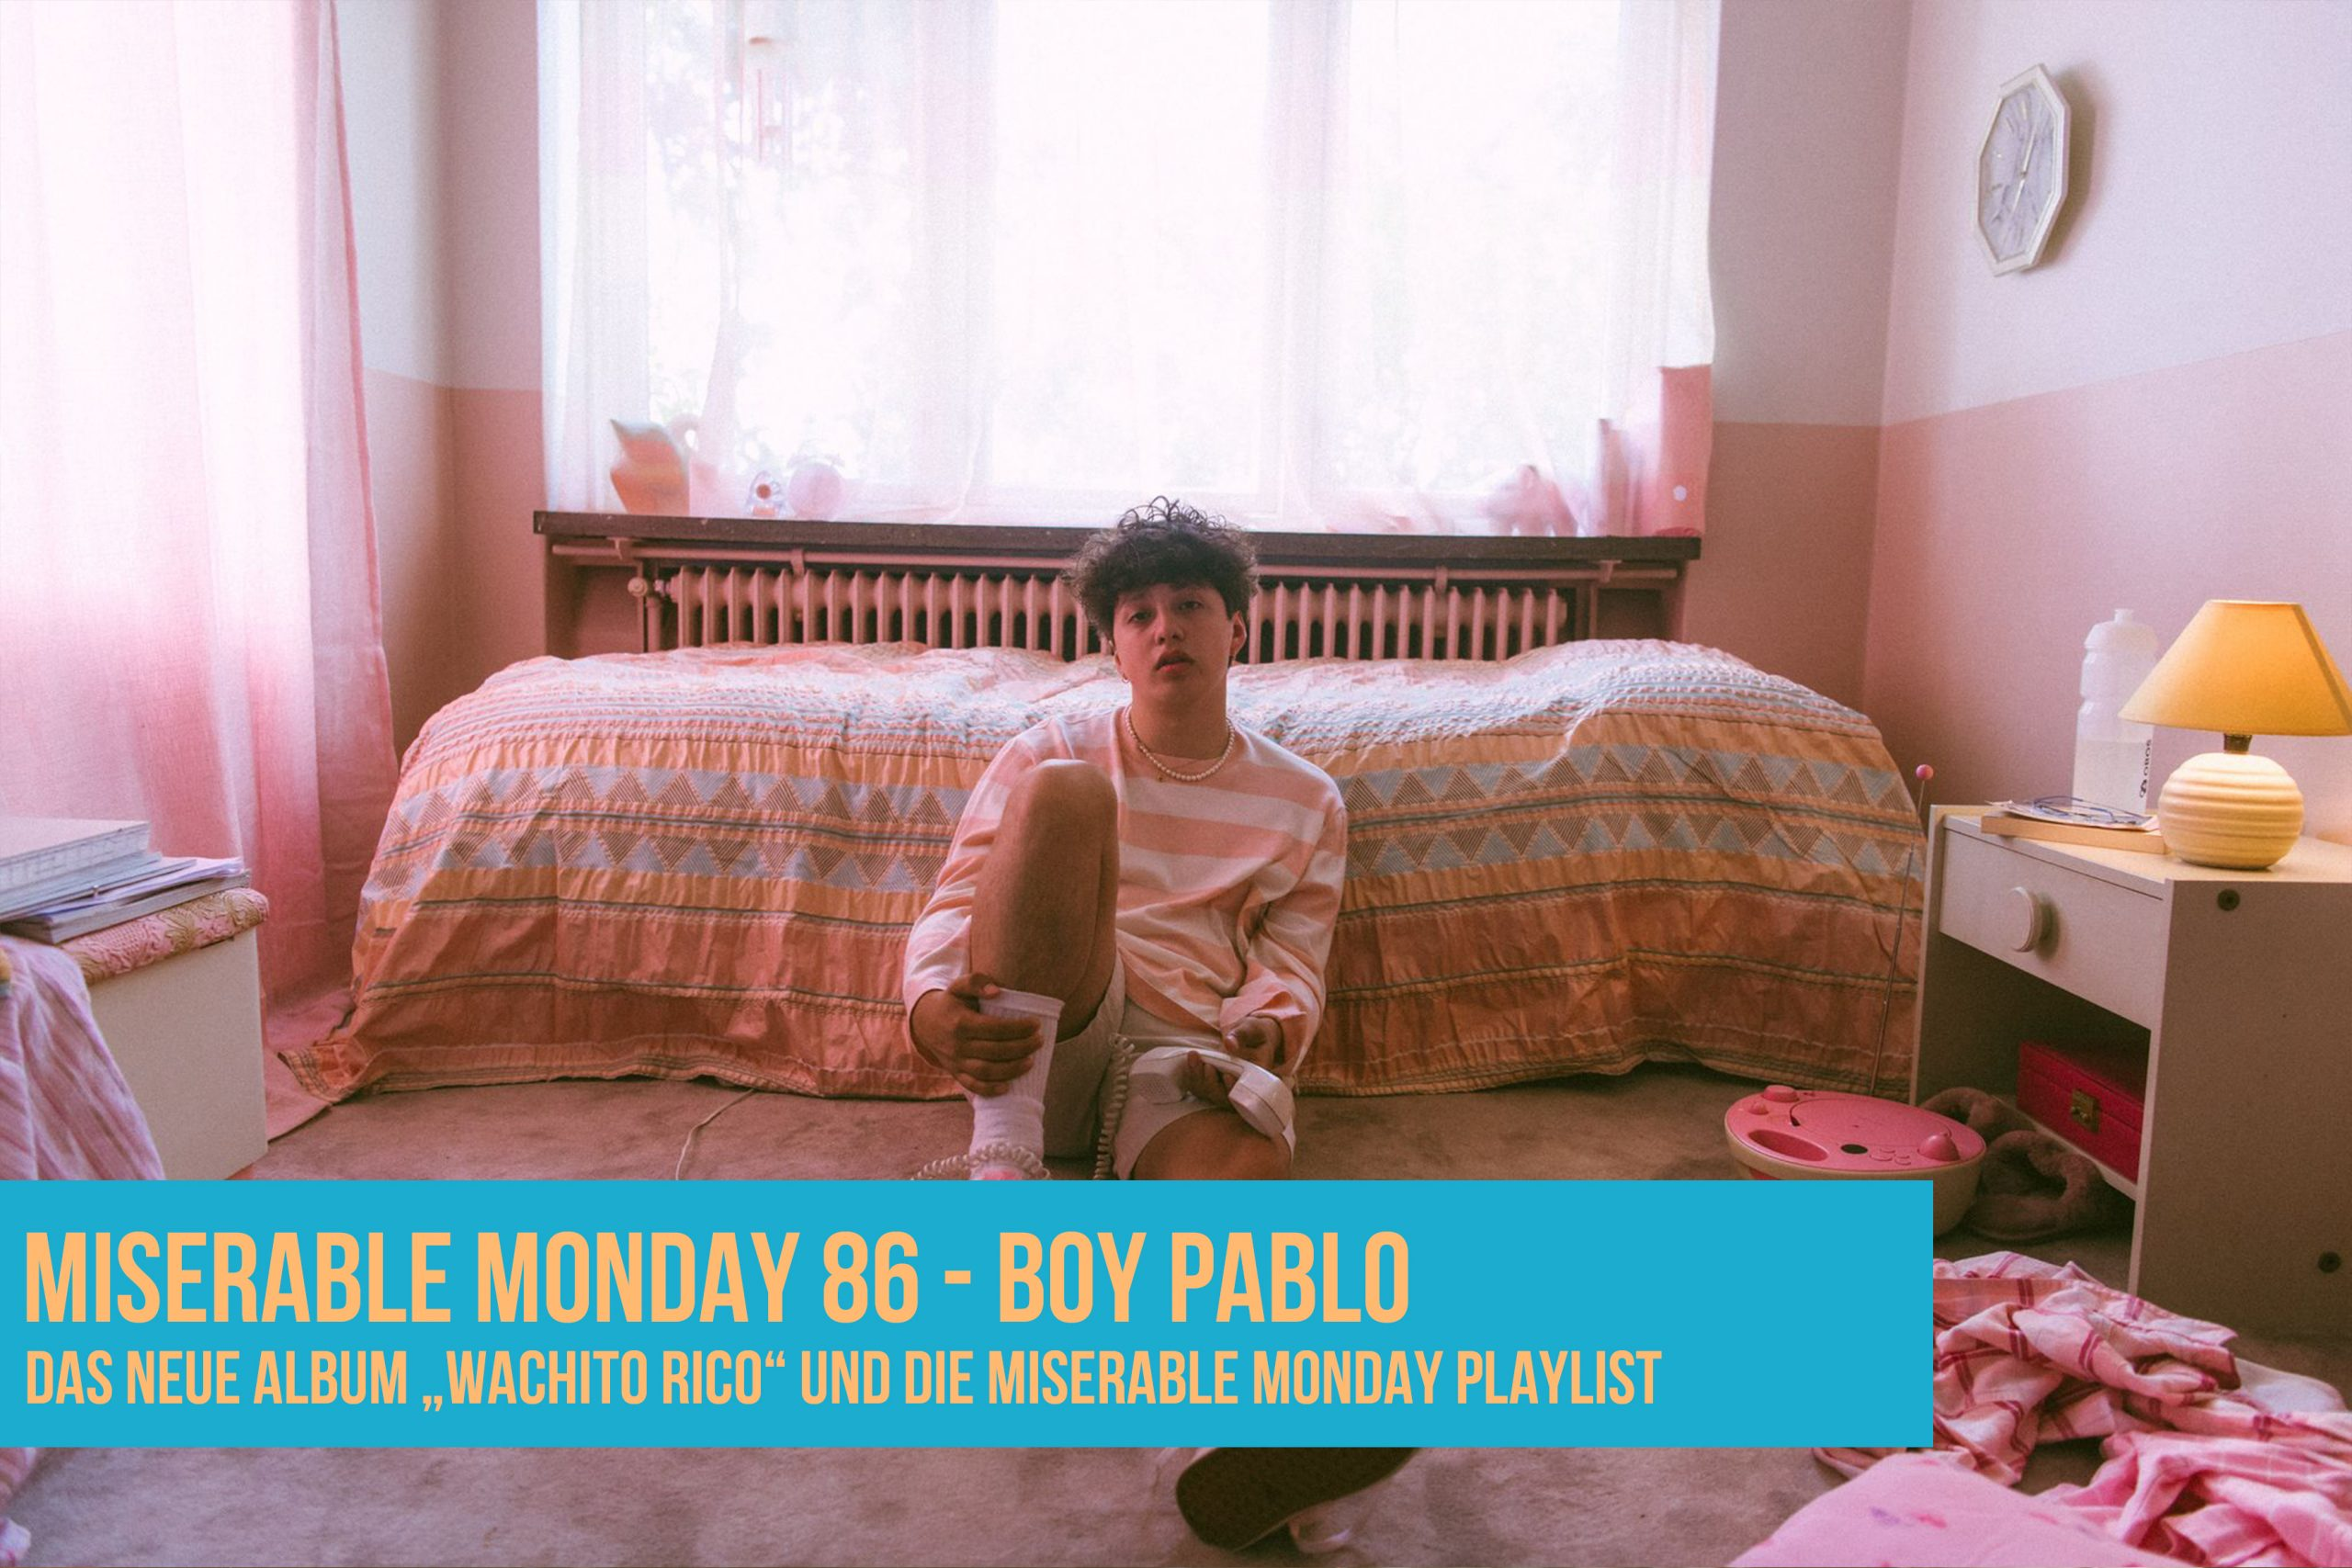 86 - Boy Pablo